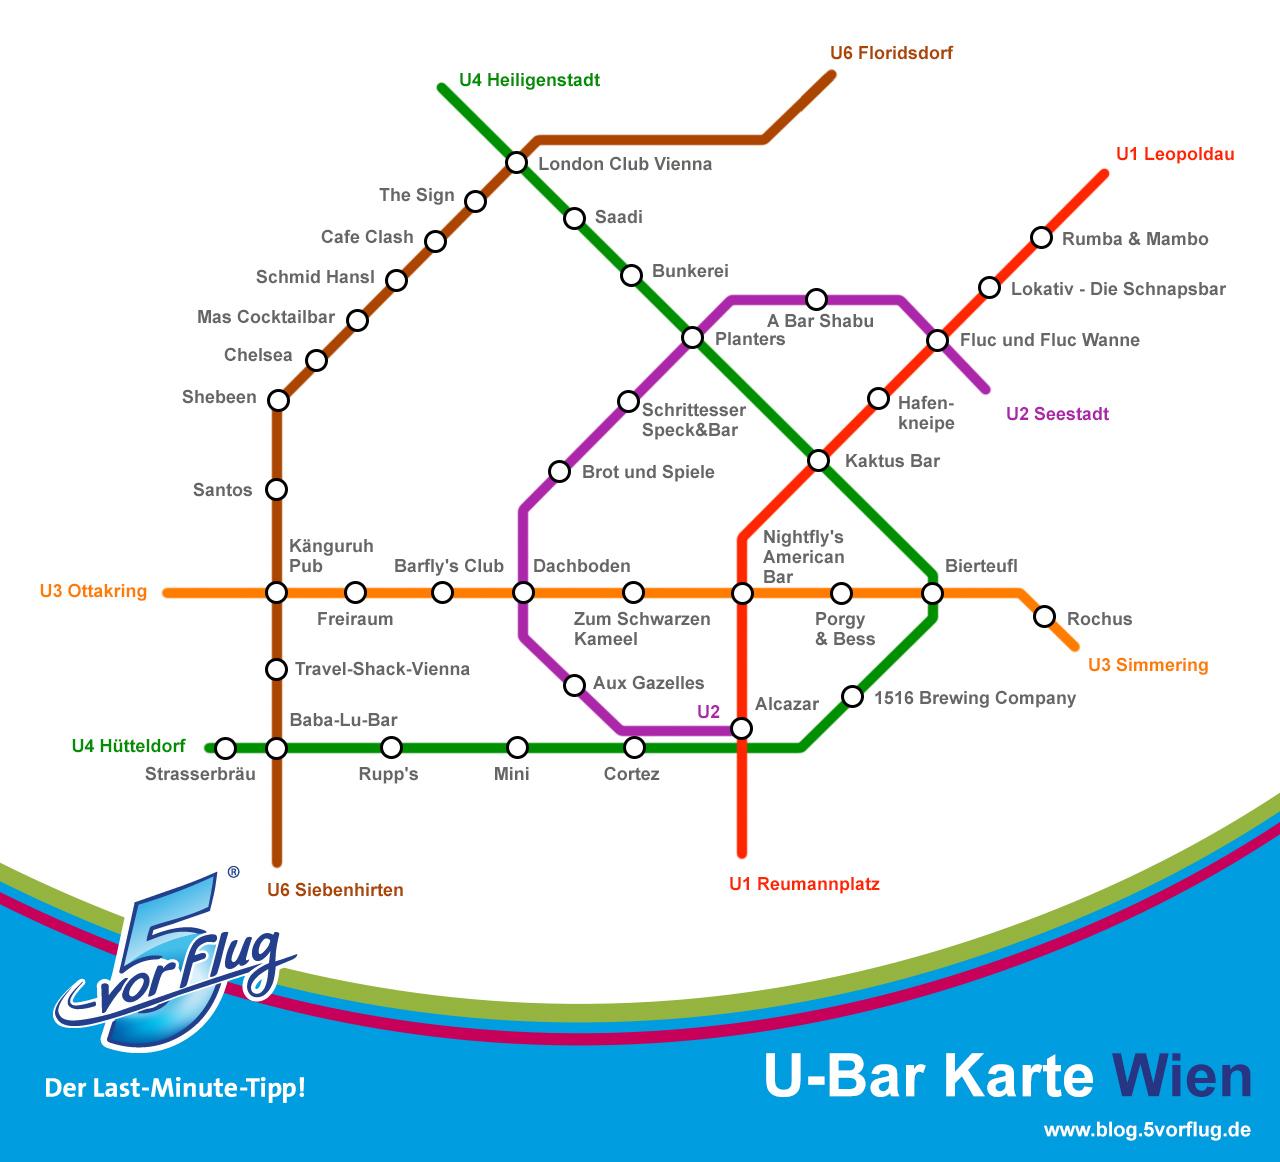 Die besten Bars in Wien im U-Bahnnetz